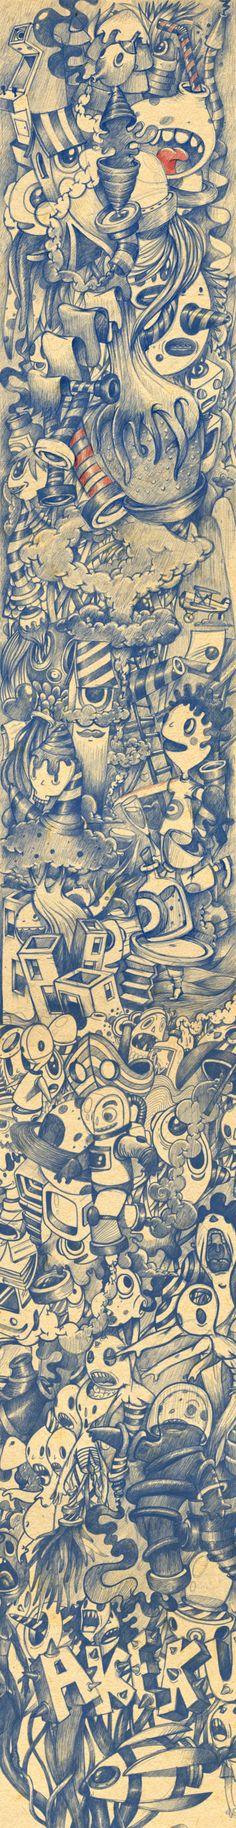 Long long long sketch by oscar llorens, via Behance